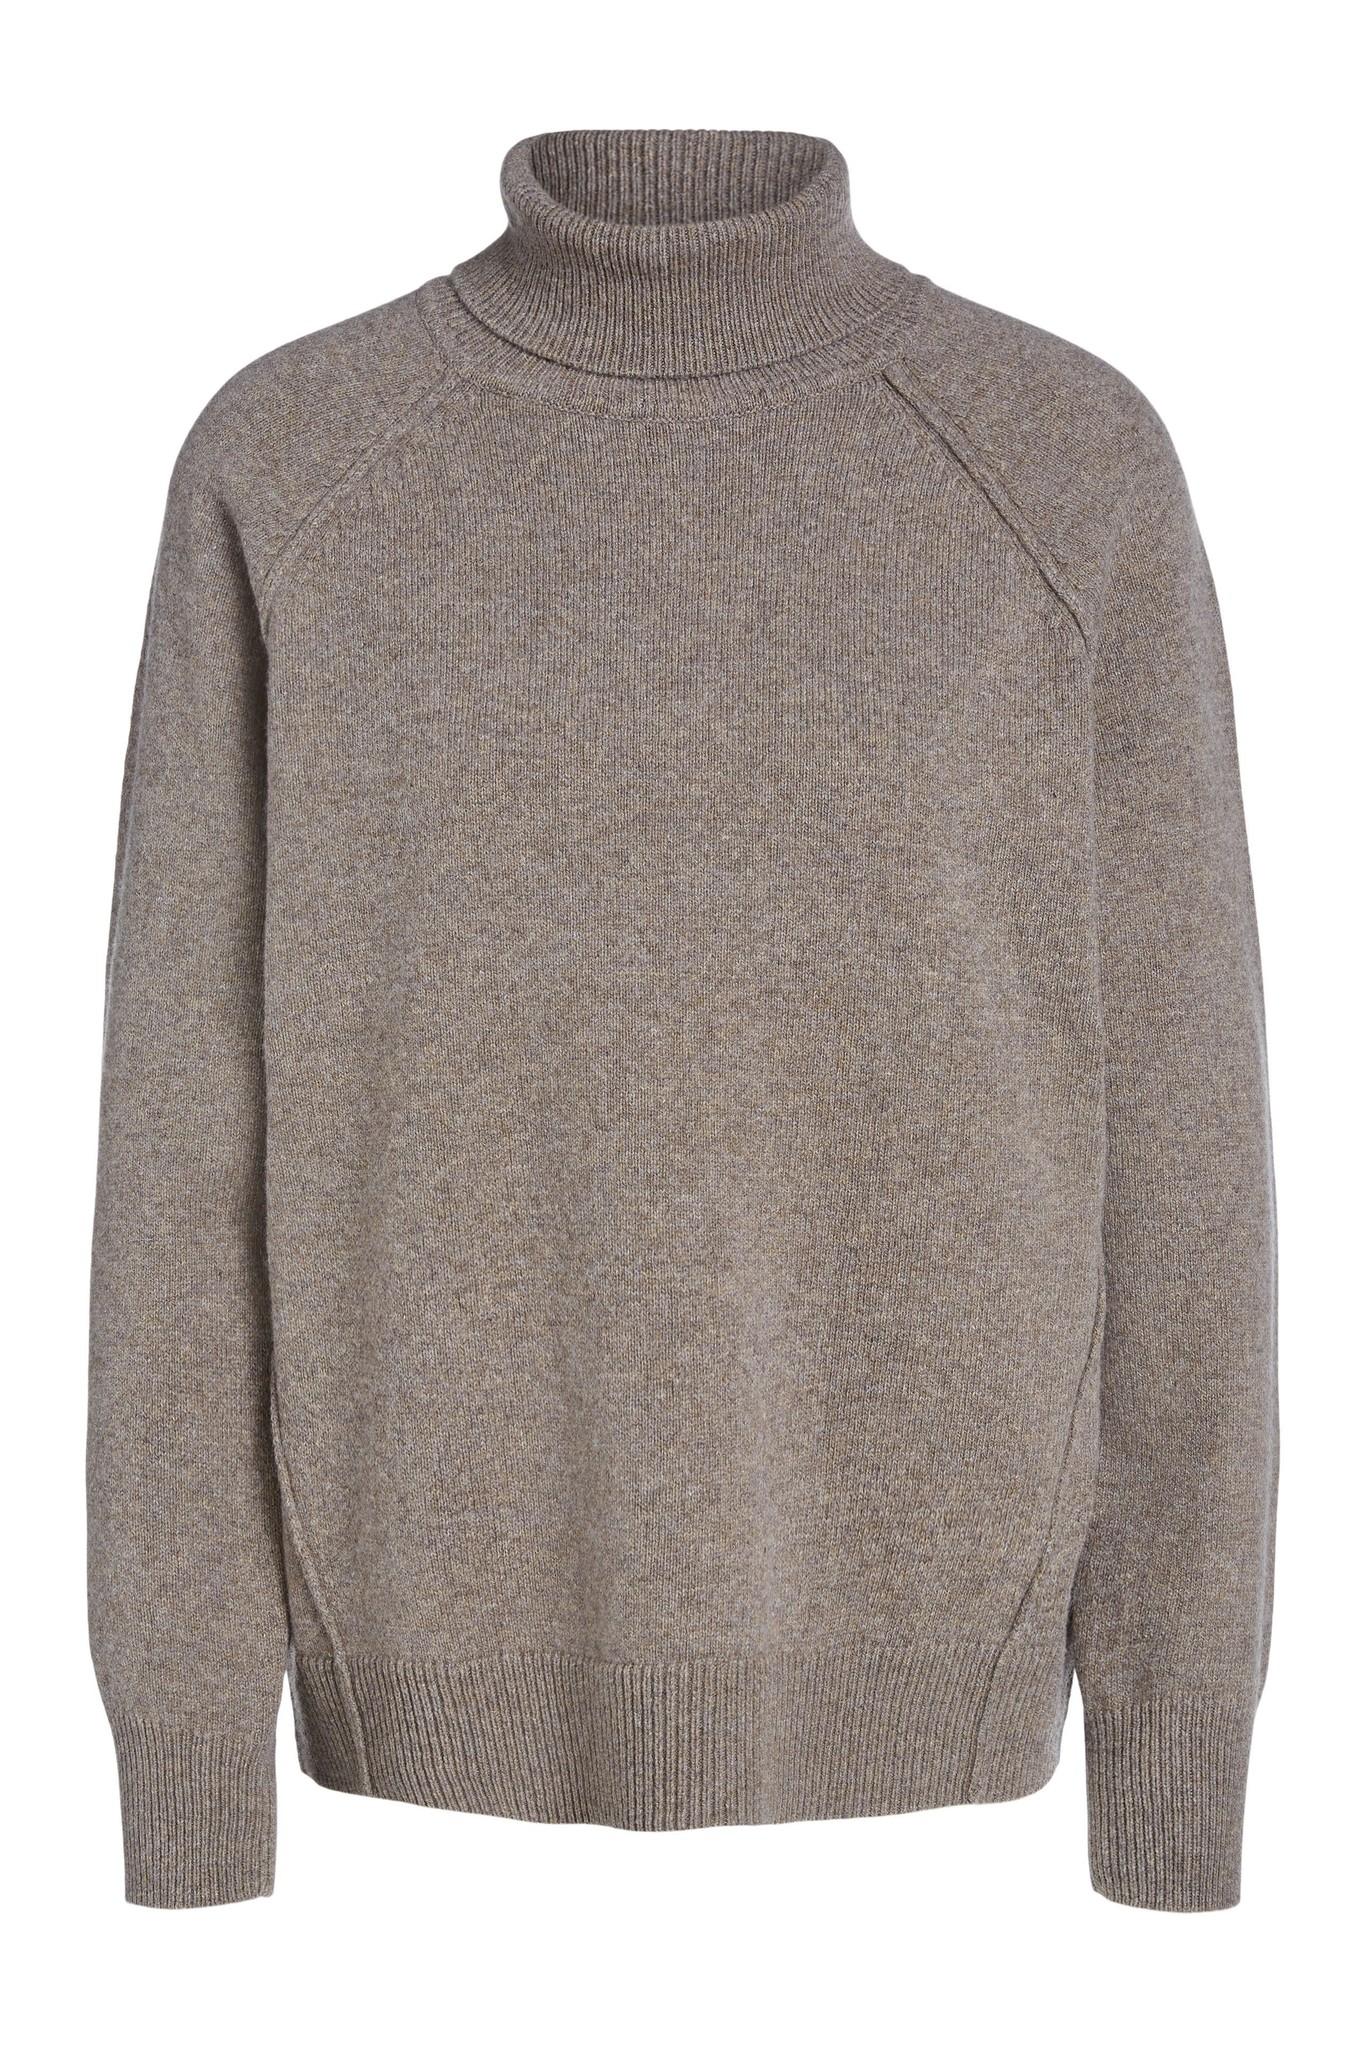 SET pullover 74281 8387-1